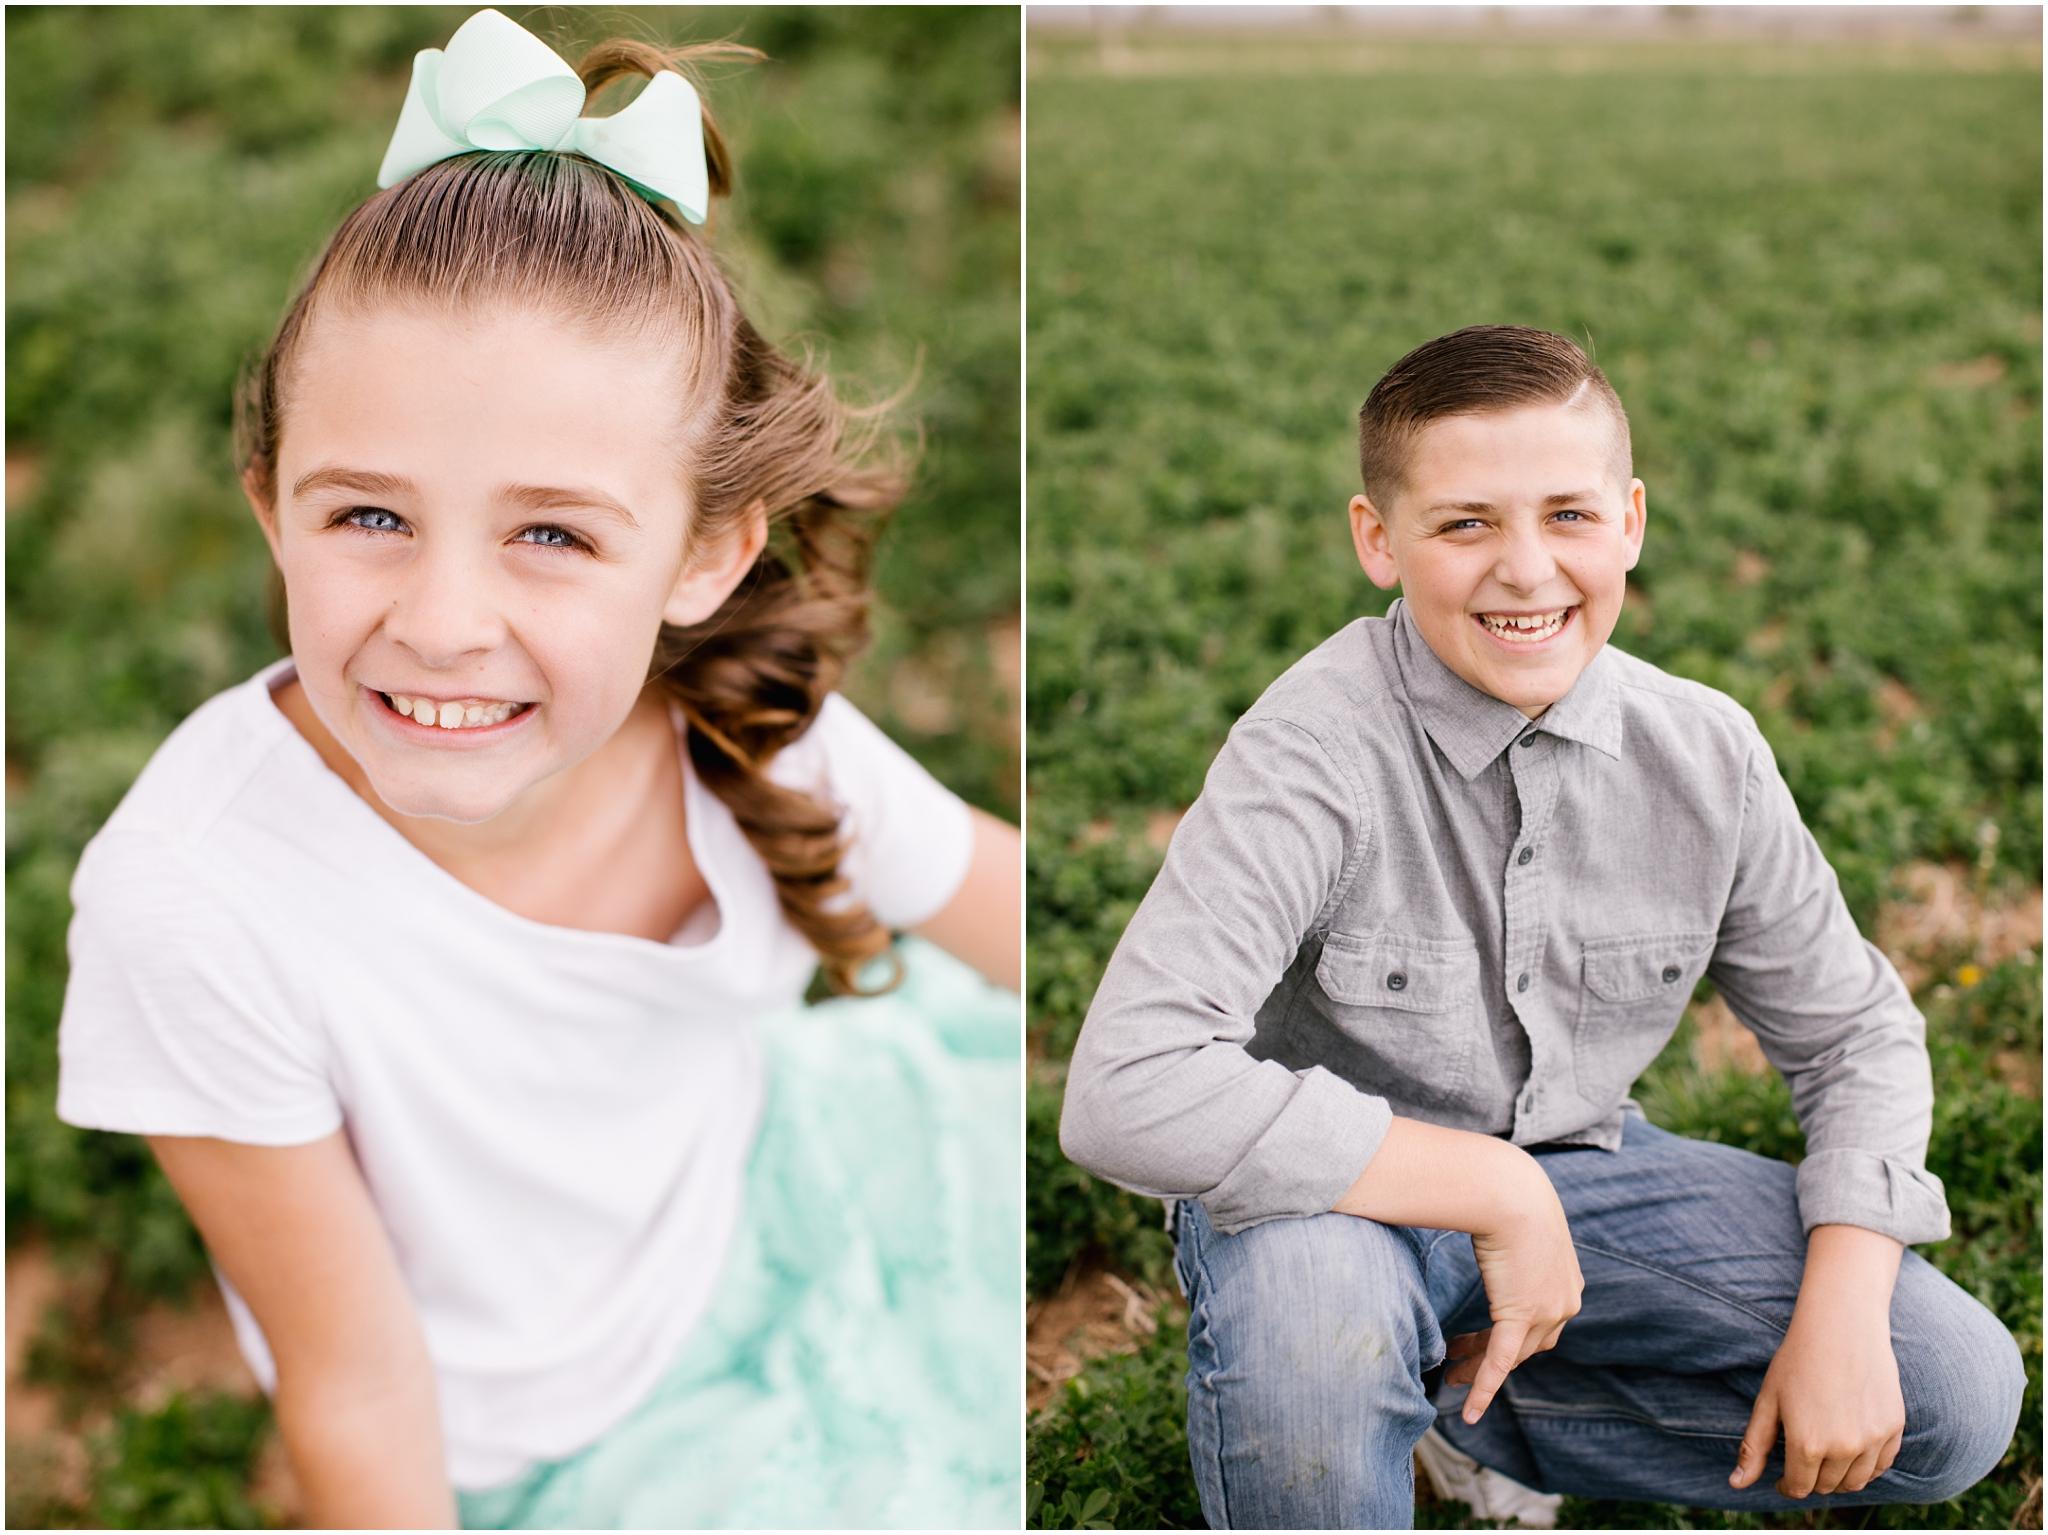 Conner-66_Lizzie-B-Imagery-Utah-Family-Photographer-Salt-Lake-City-Park-City-Utah-County.jpg